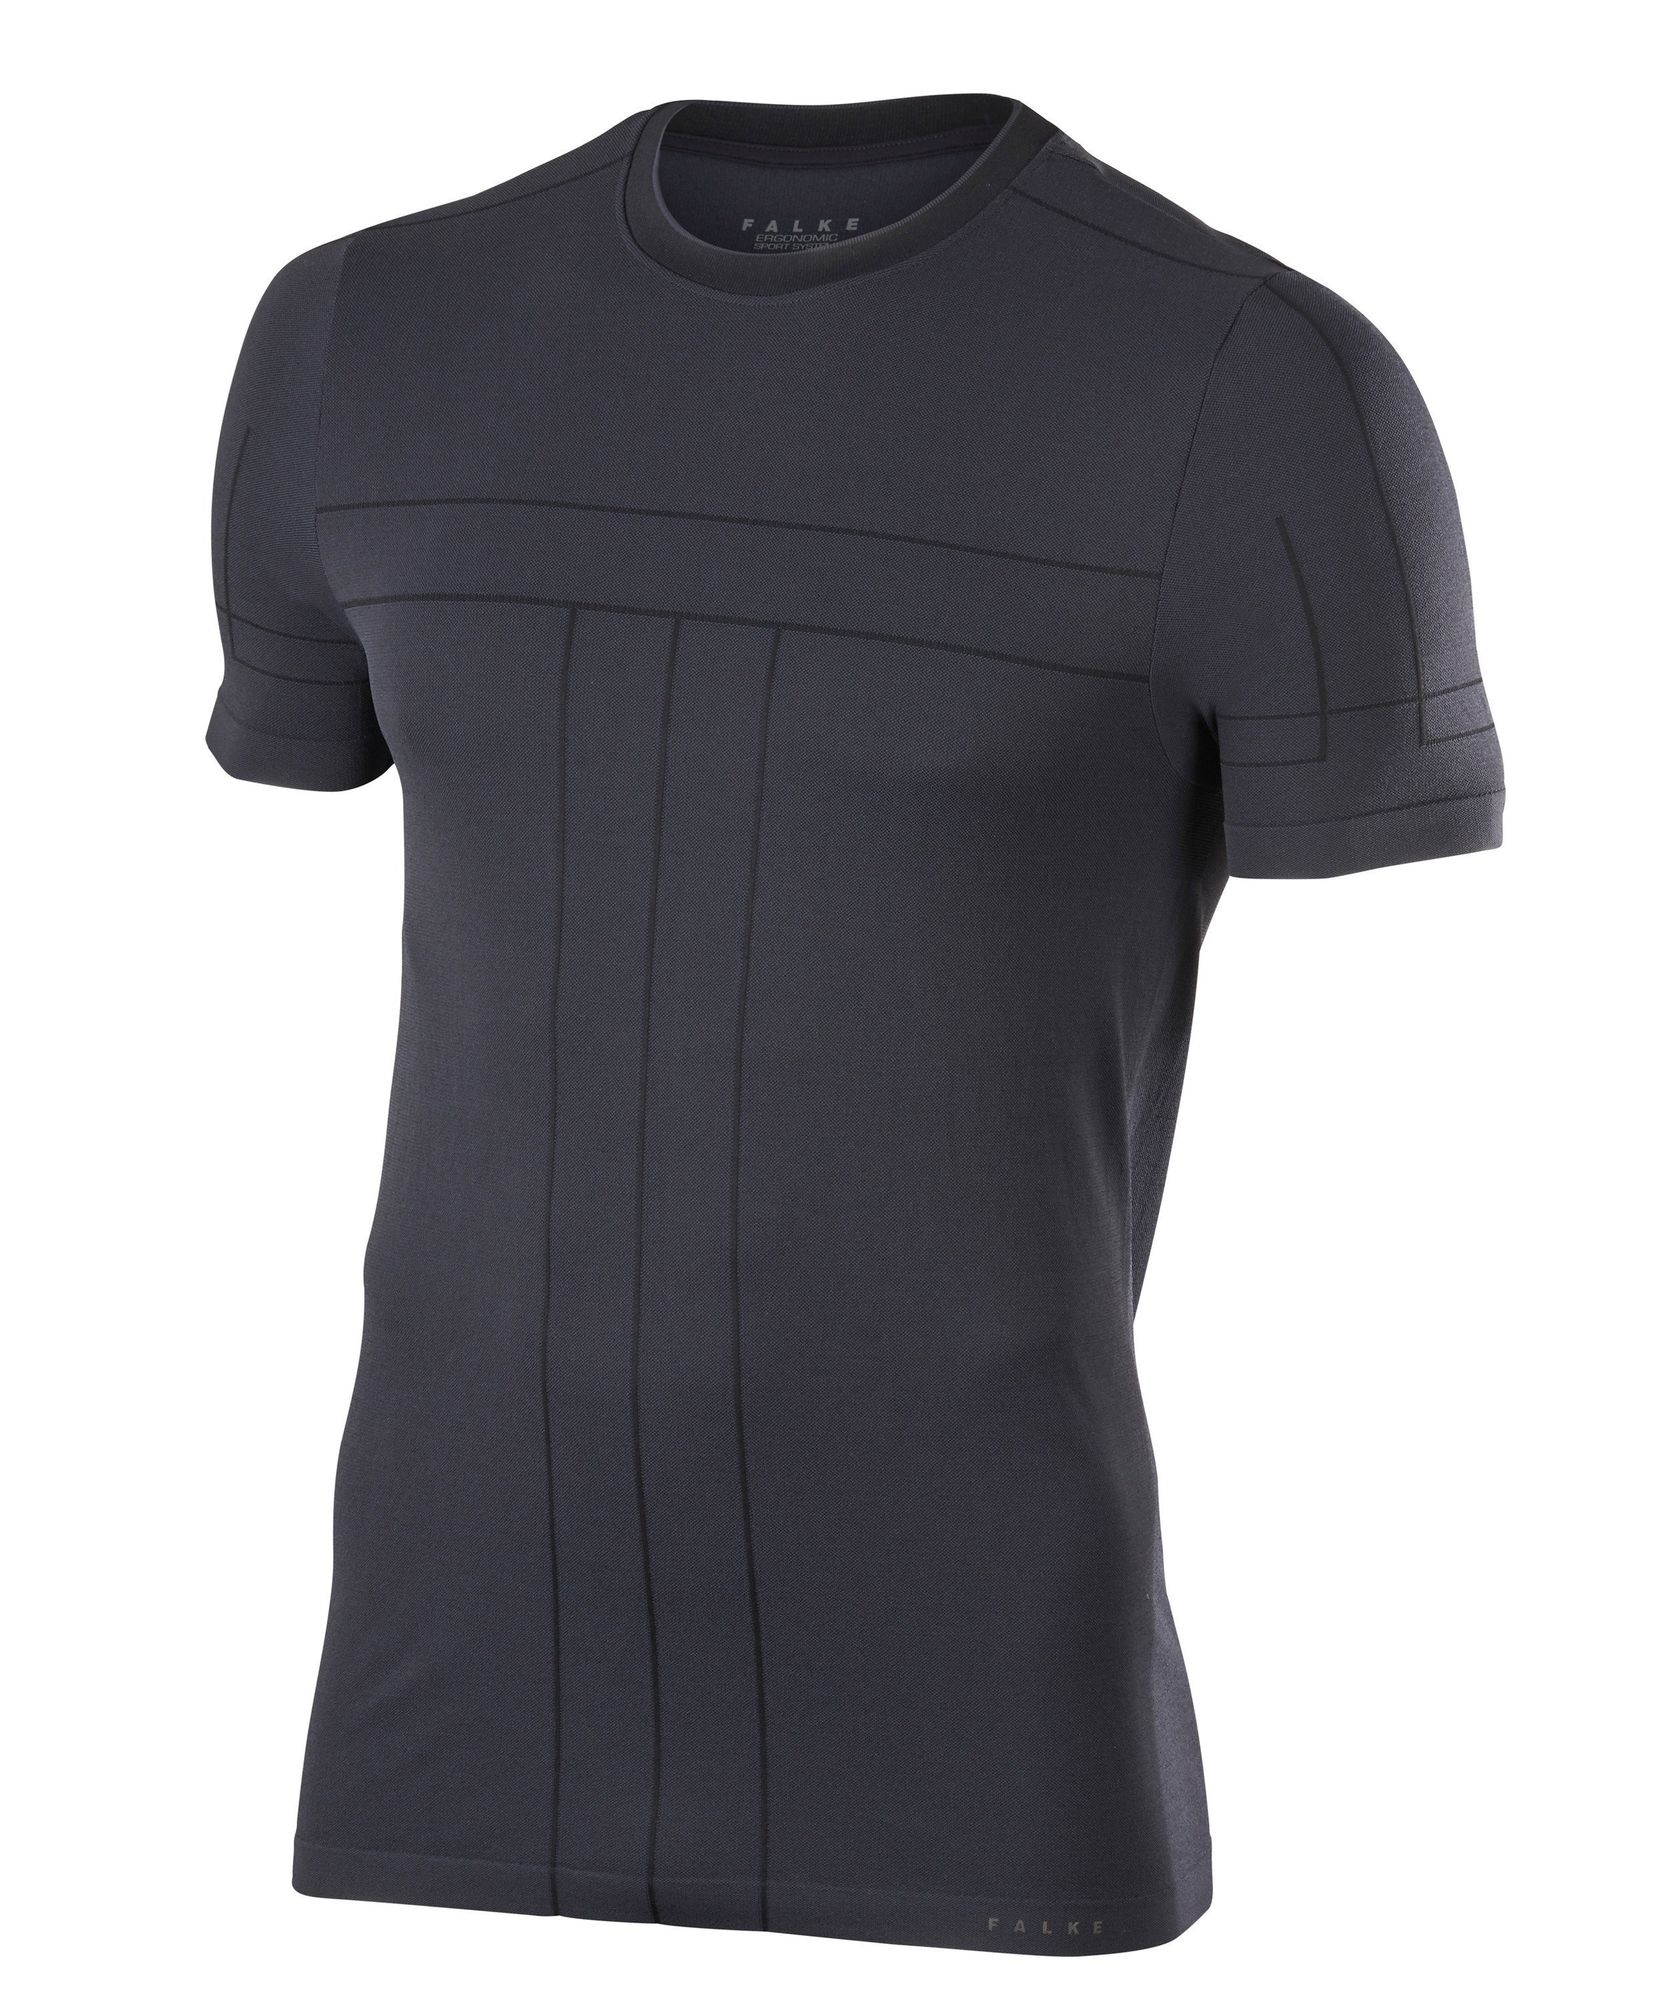 Falke Basic T-Shirt (Schwarz)